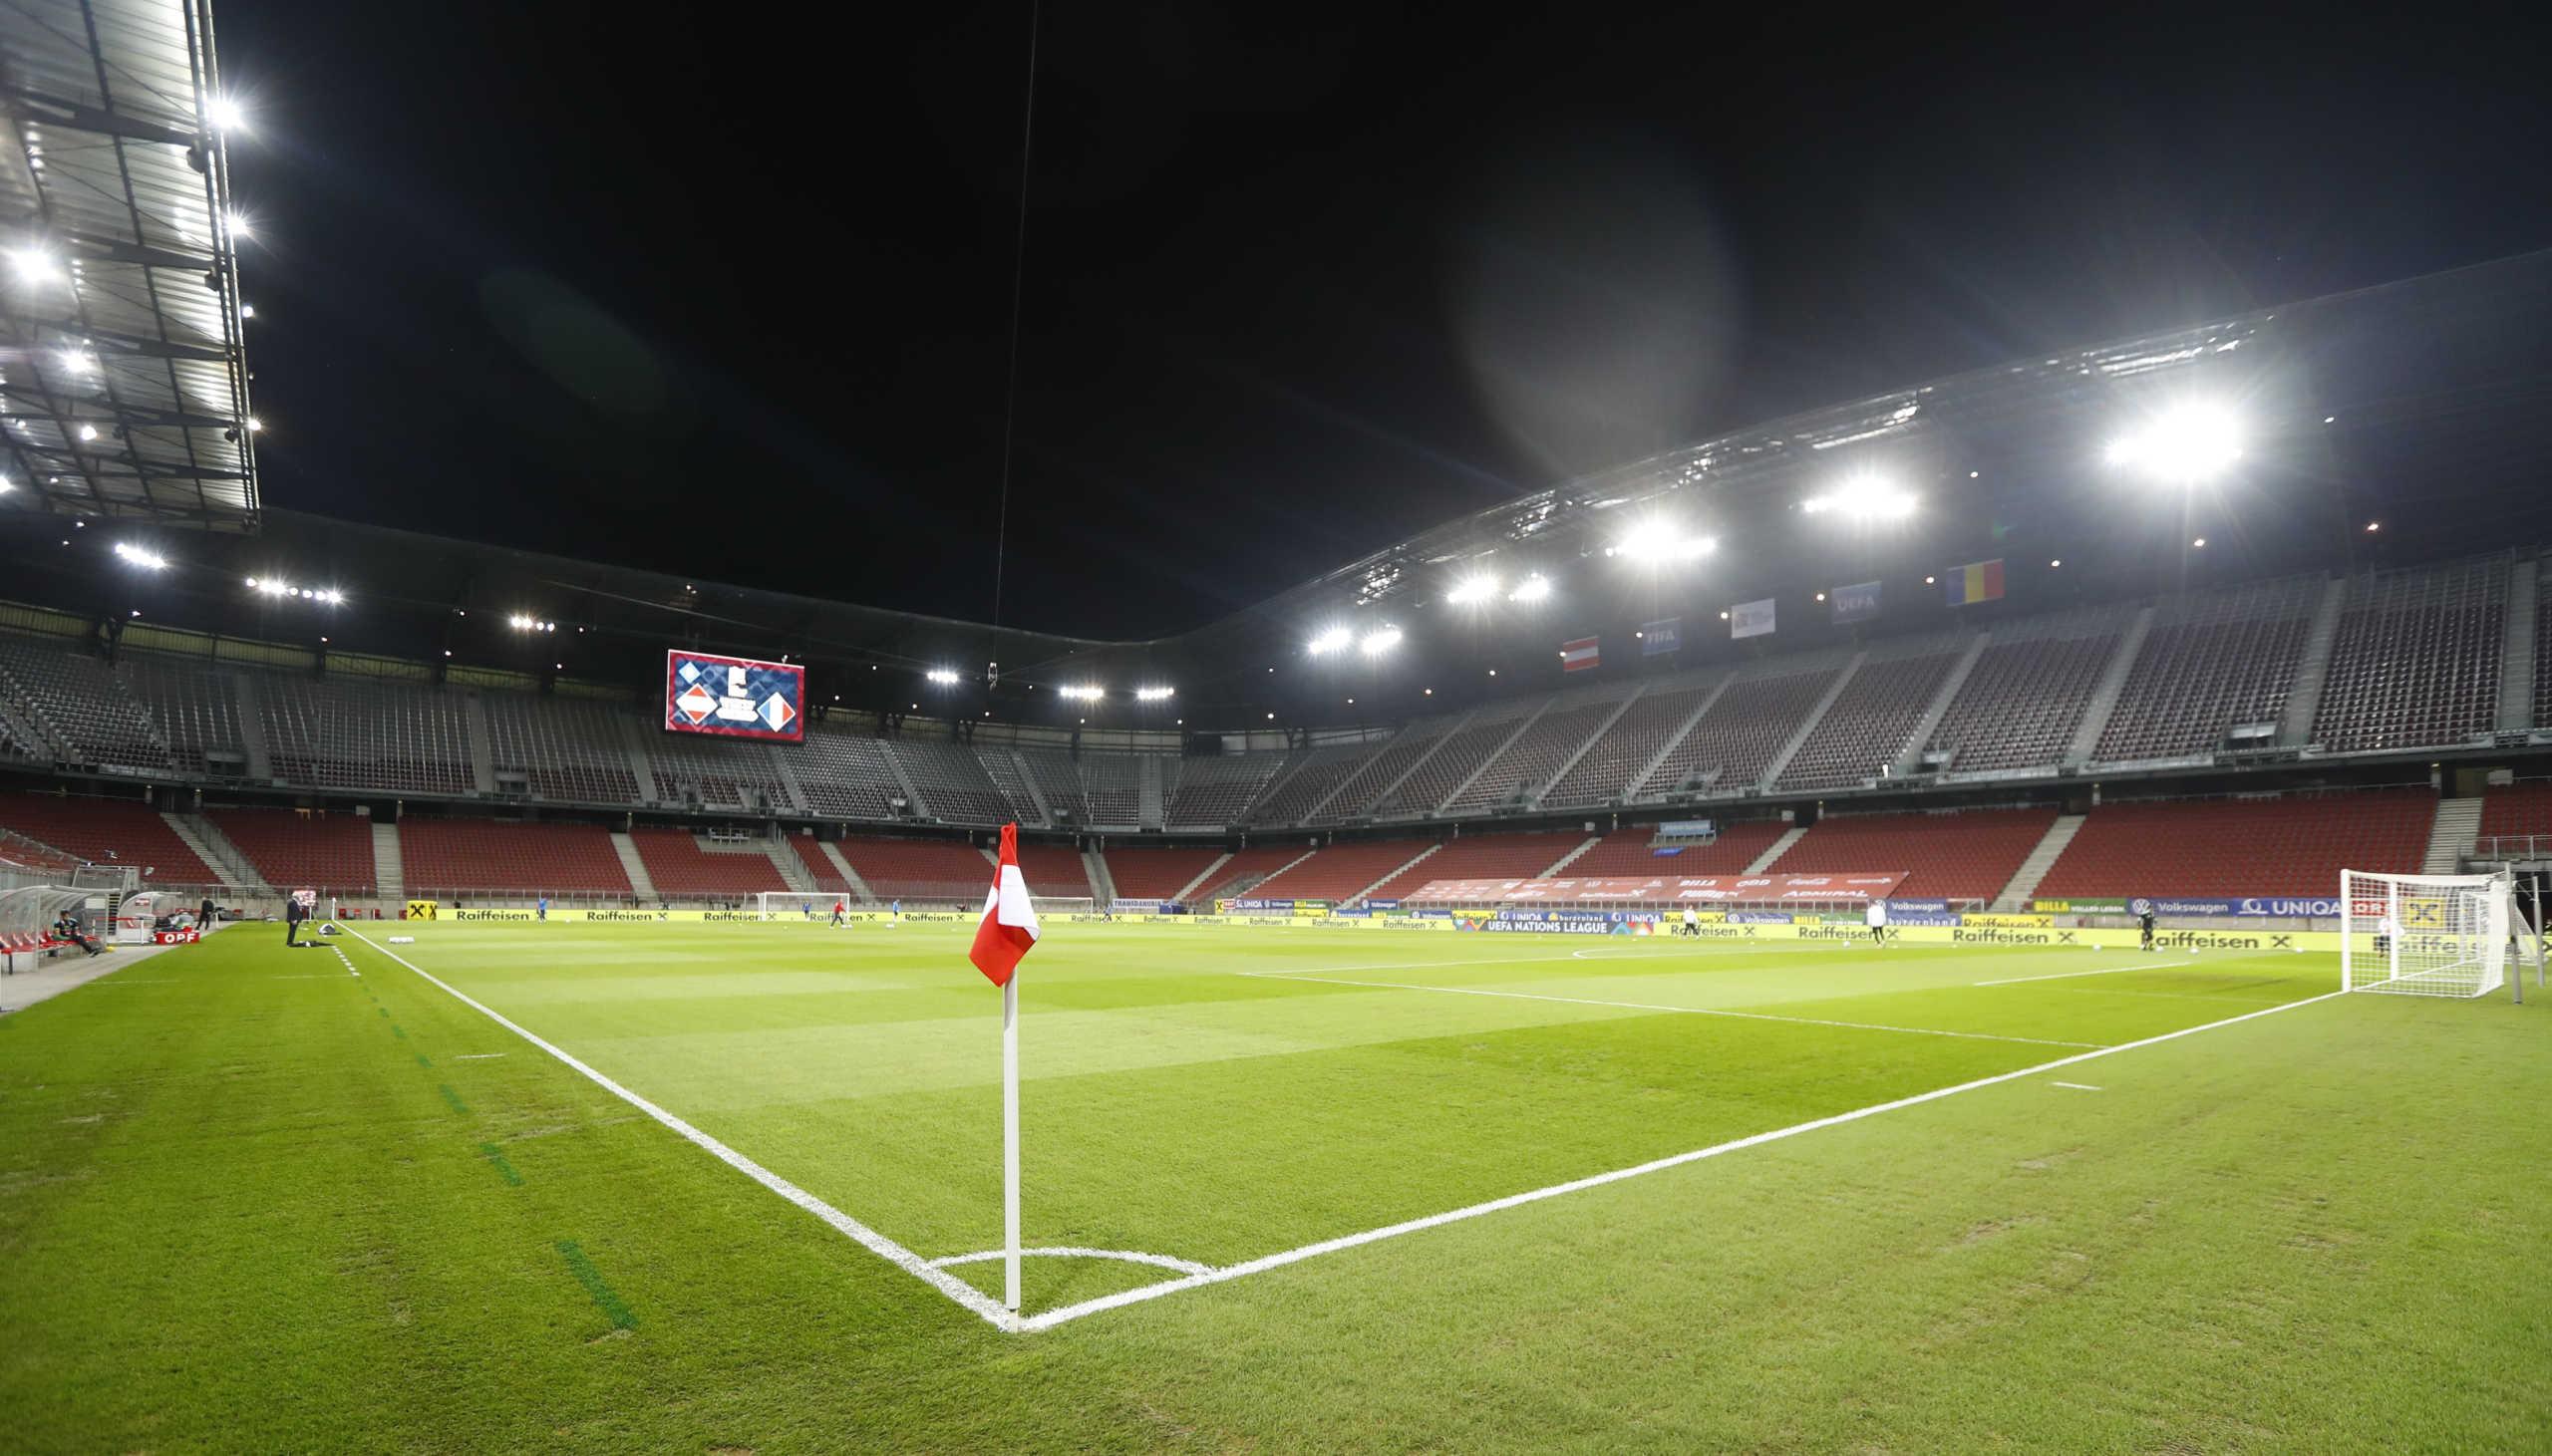 Nations League: Η Νορβηγία έχασε στα χαρτιά το ματς με τη Ρουμανία αλλά ζητάει… κλήρωση